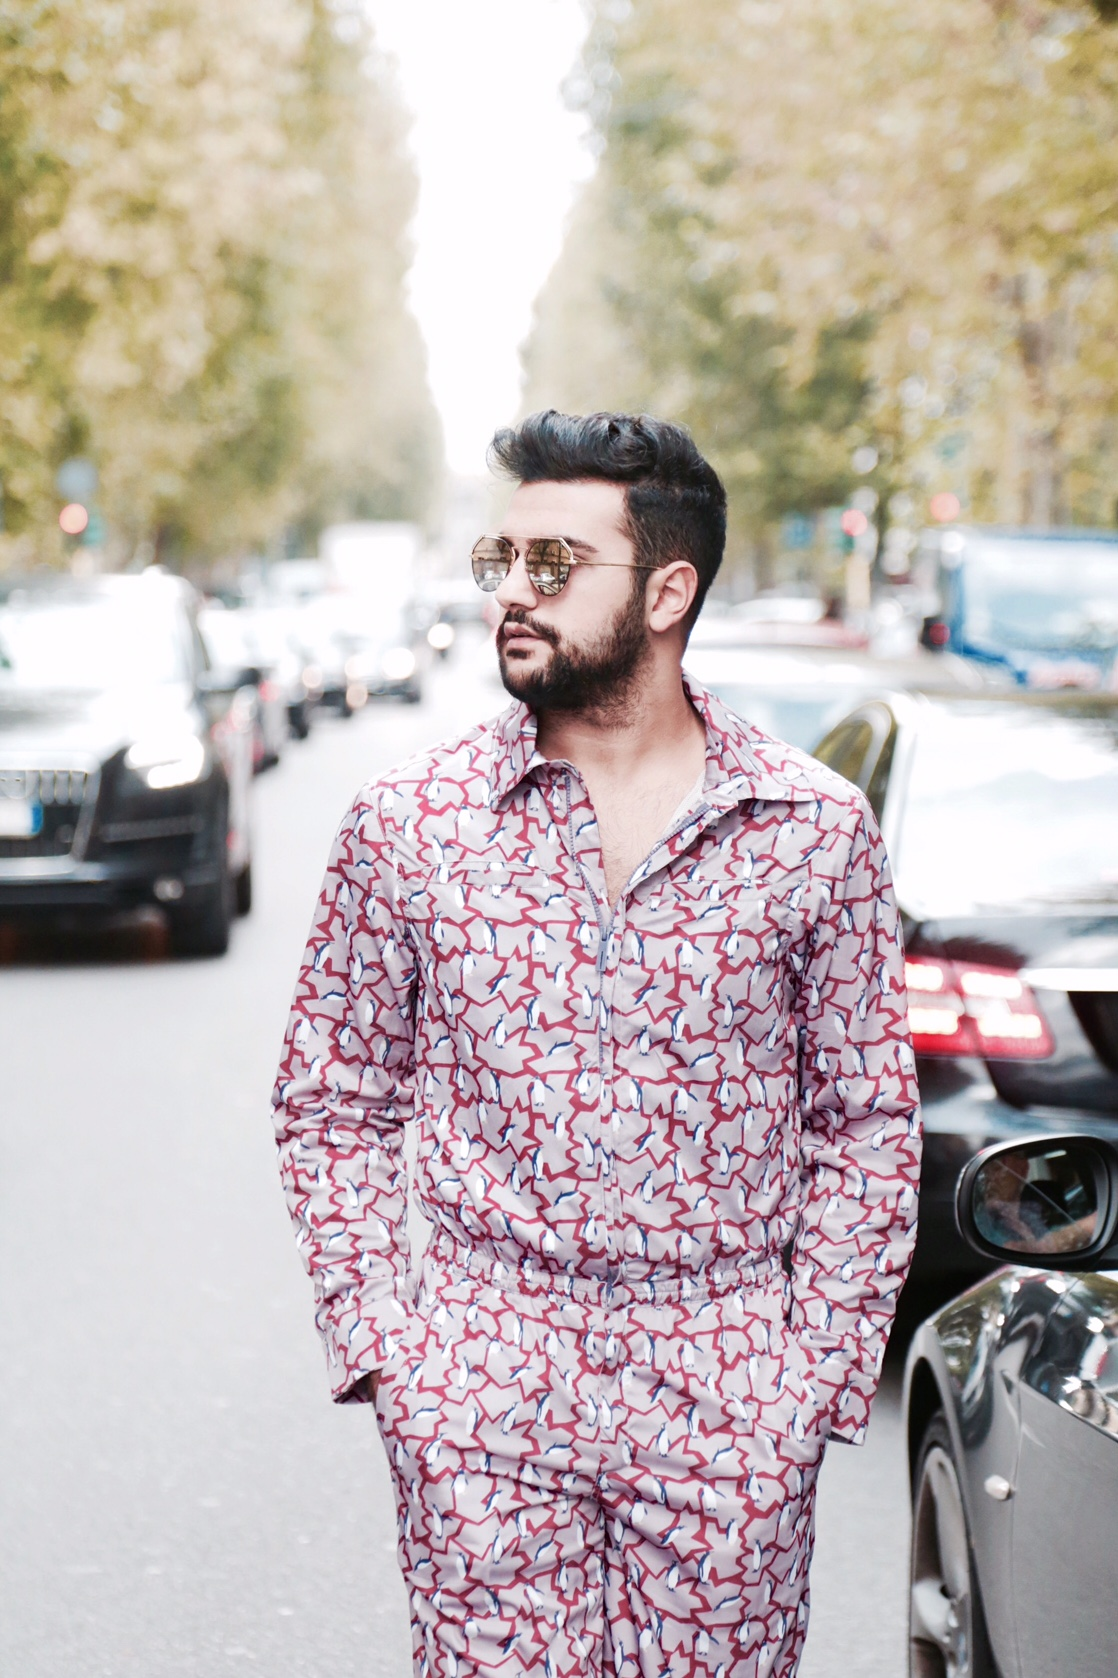 milano-street-fashion-kubilay-sakarya-emre-erdemoglu-jumpsuit